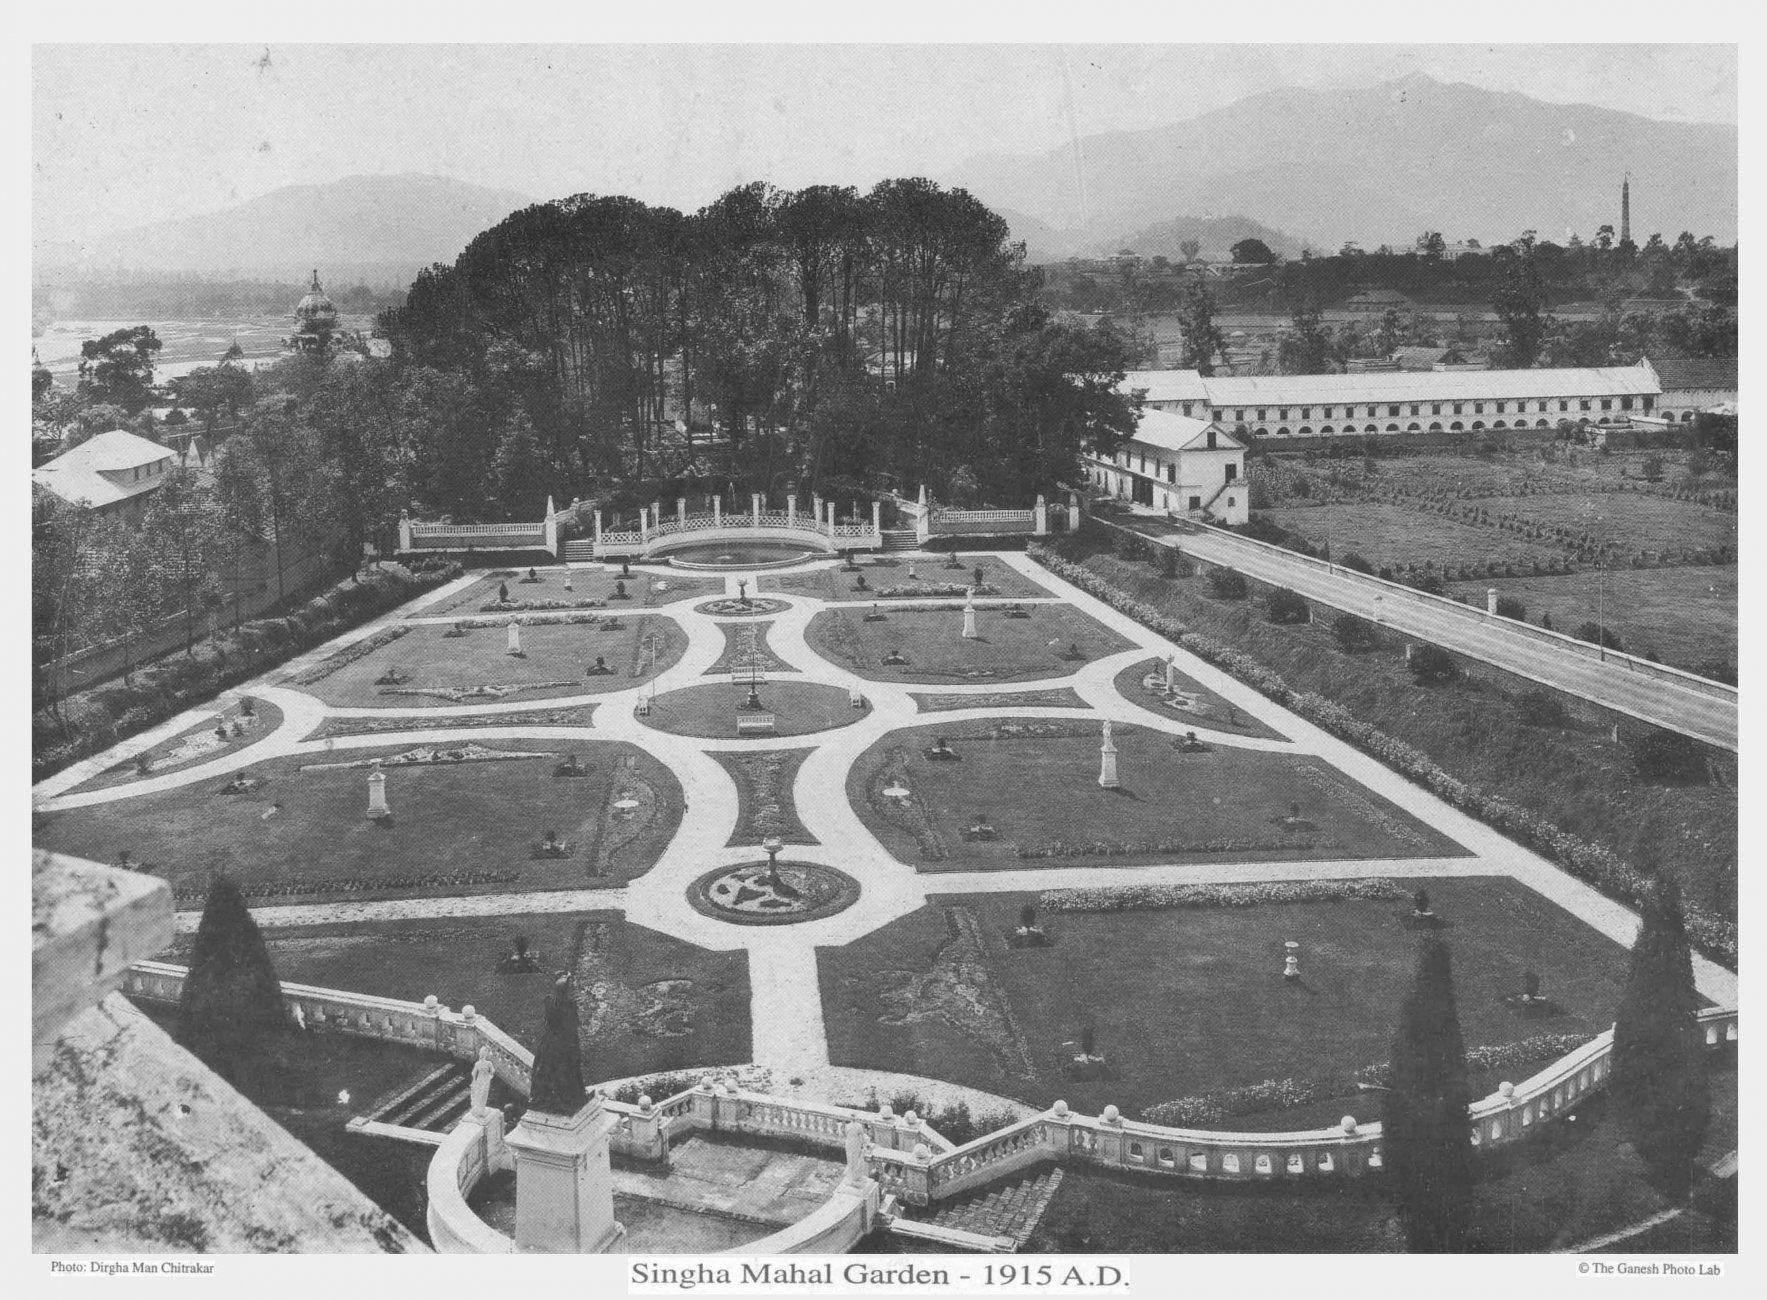 singh-mahal-garden.jpg